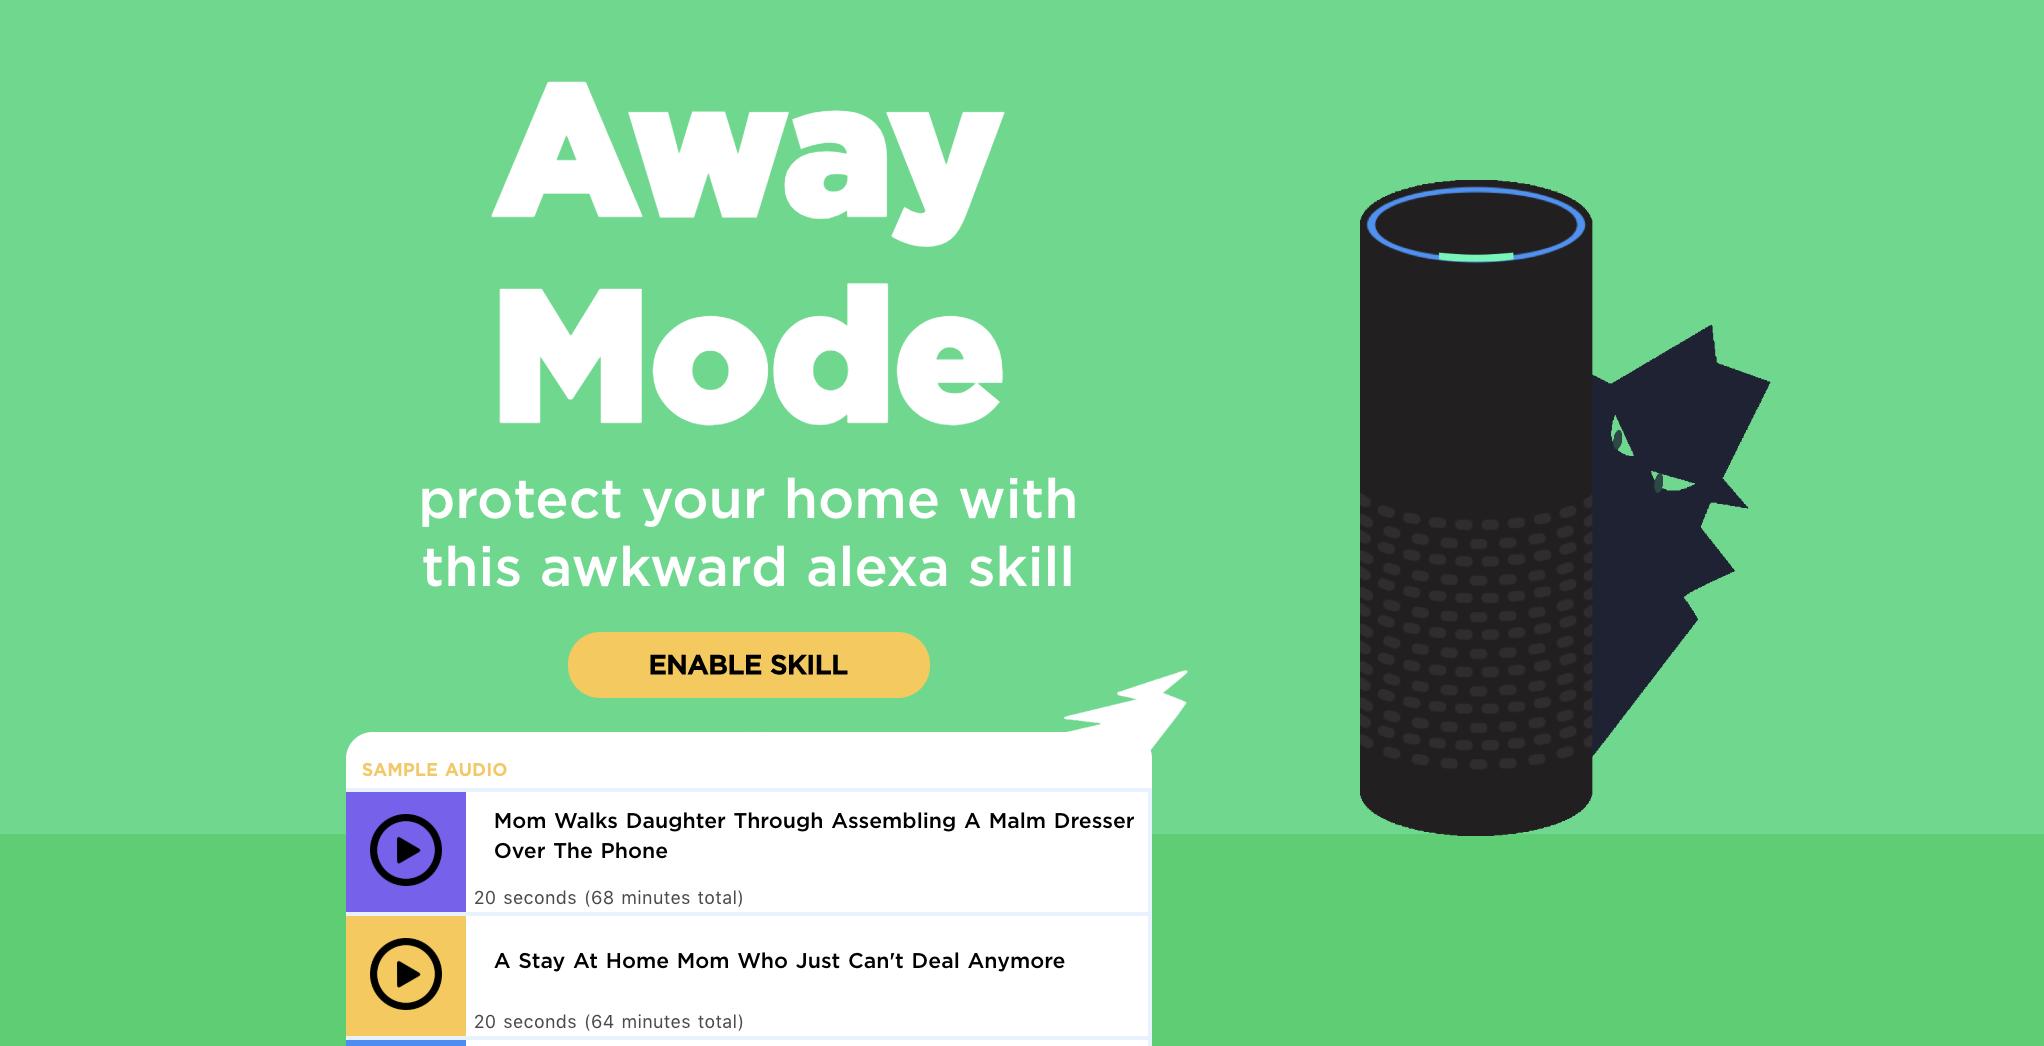 Scare off burglars with this ridiculous Alexa skill | TechCrunch